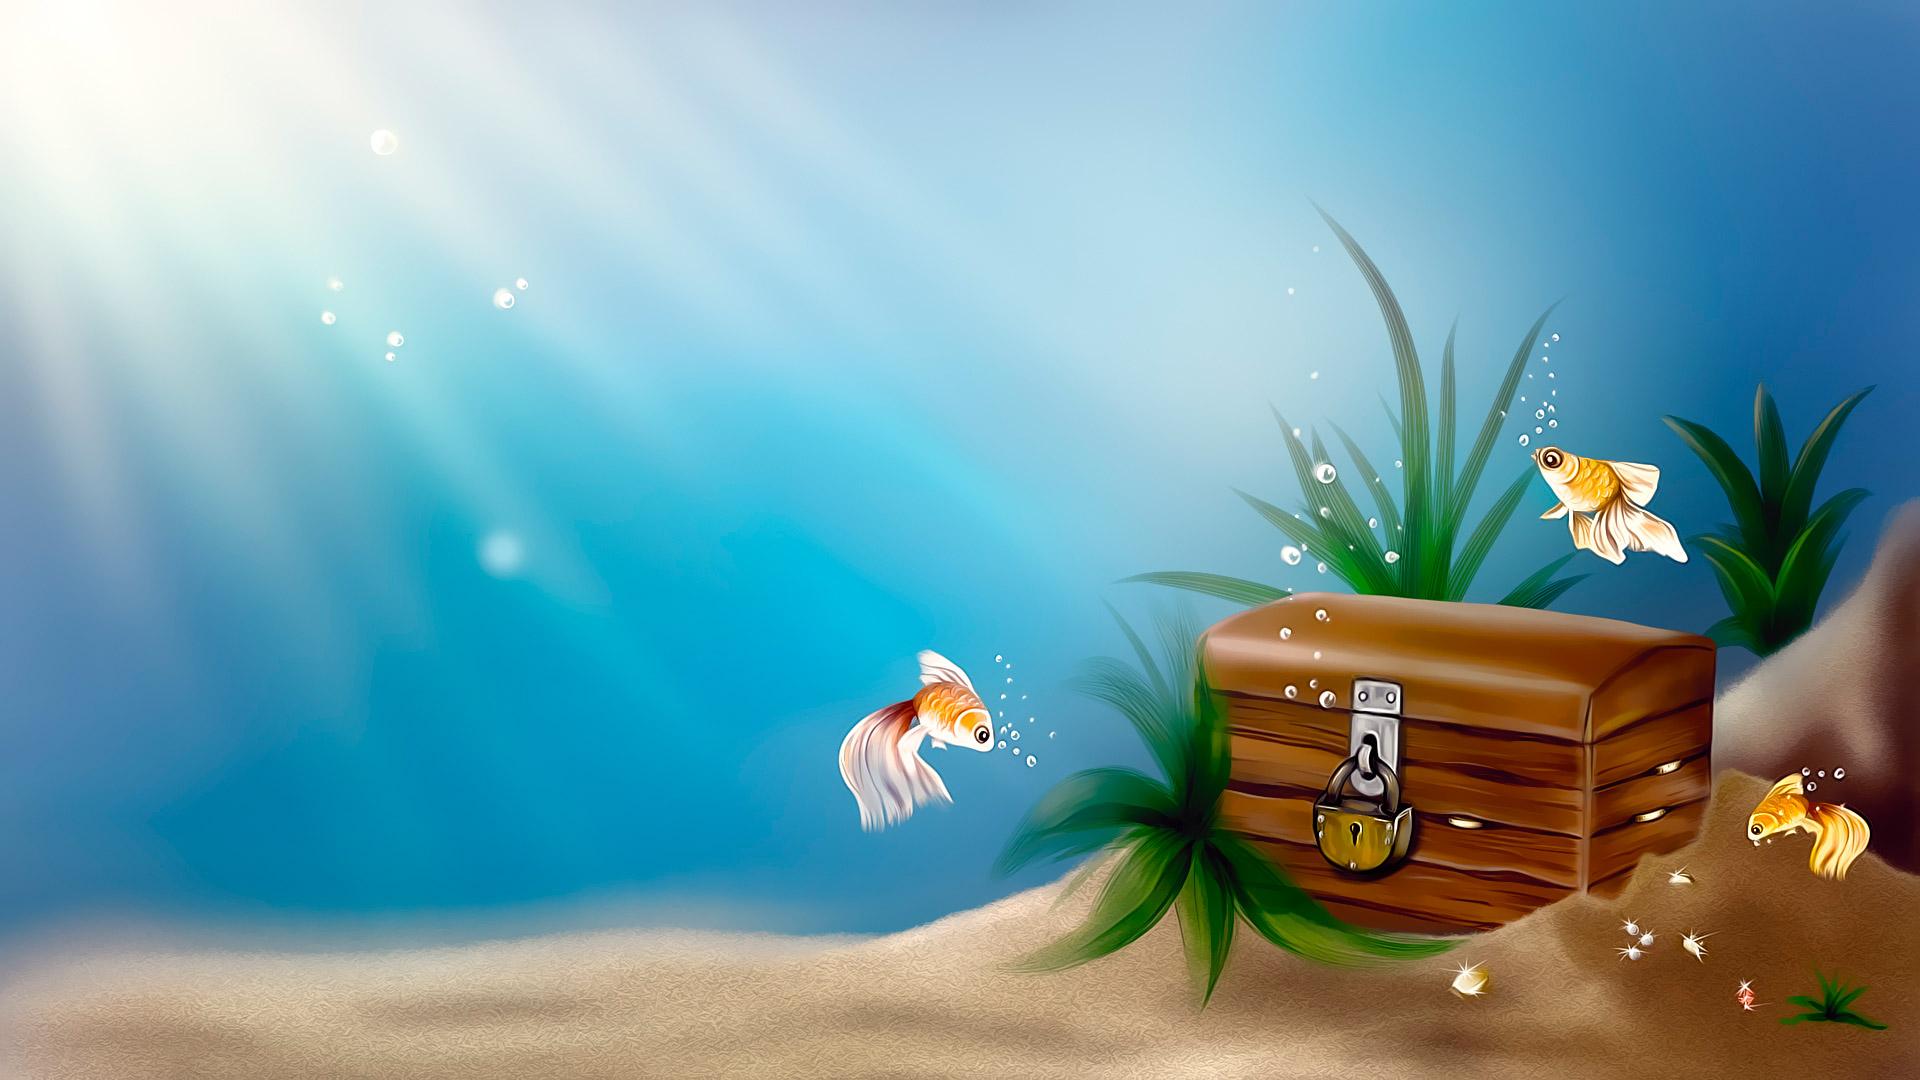 usa underwater treasures hd wallpapers